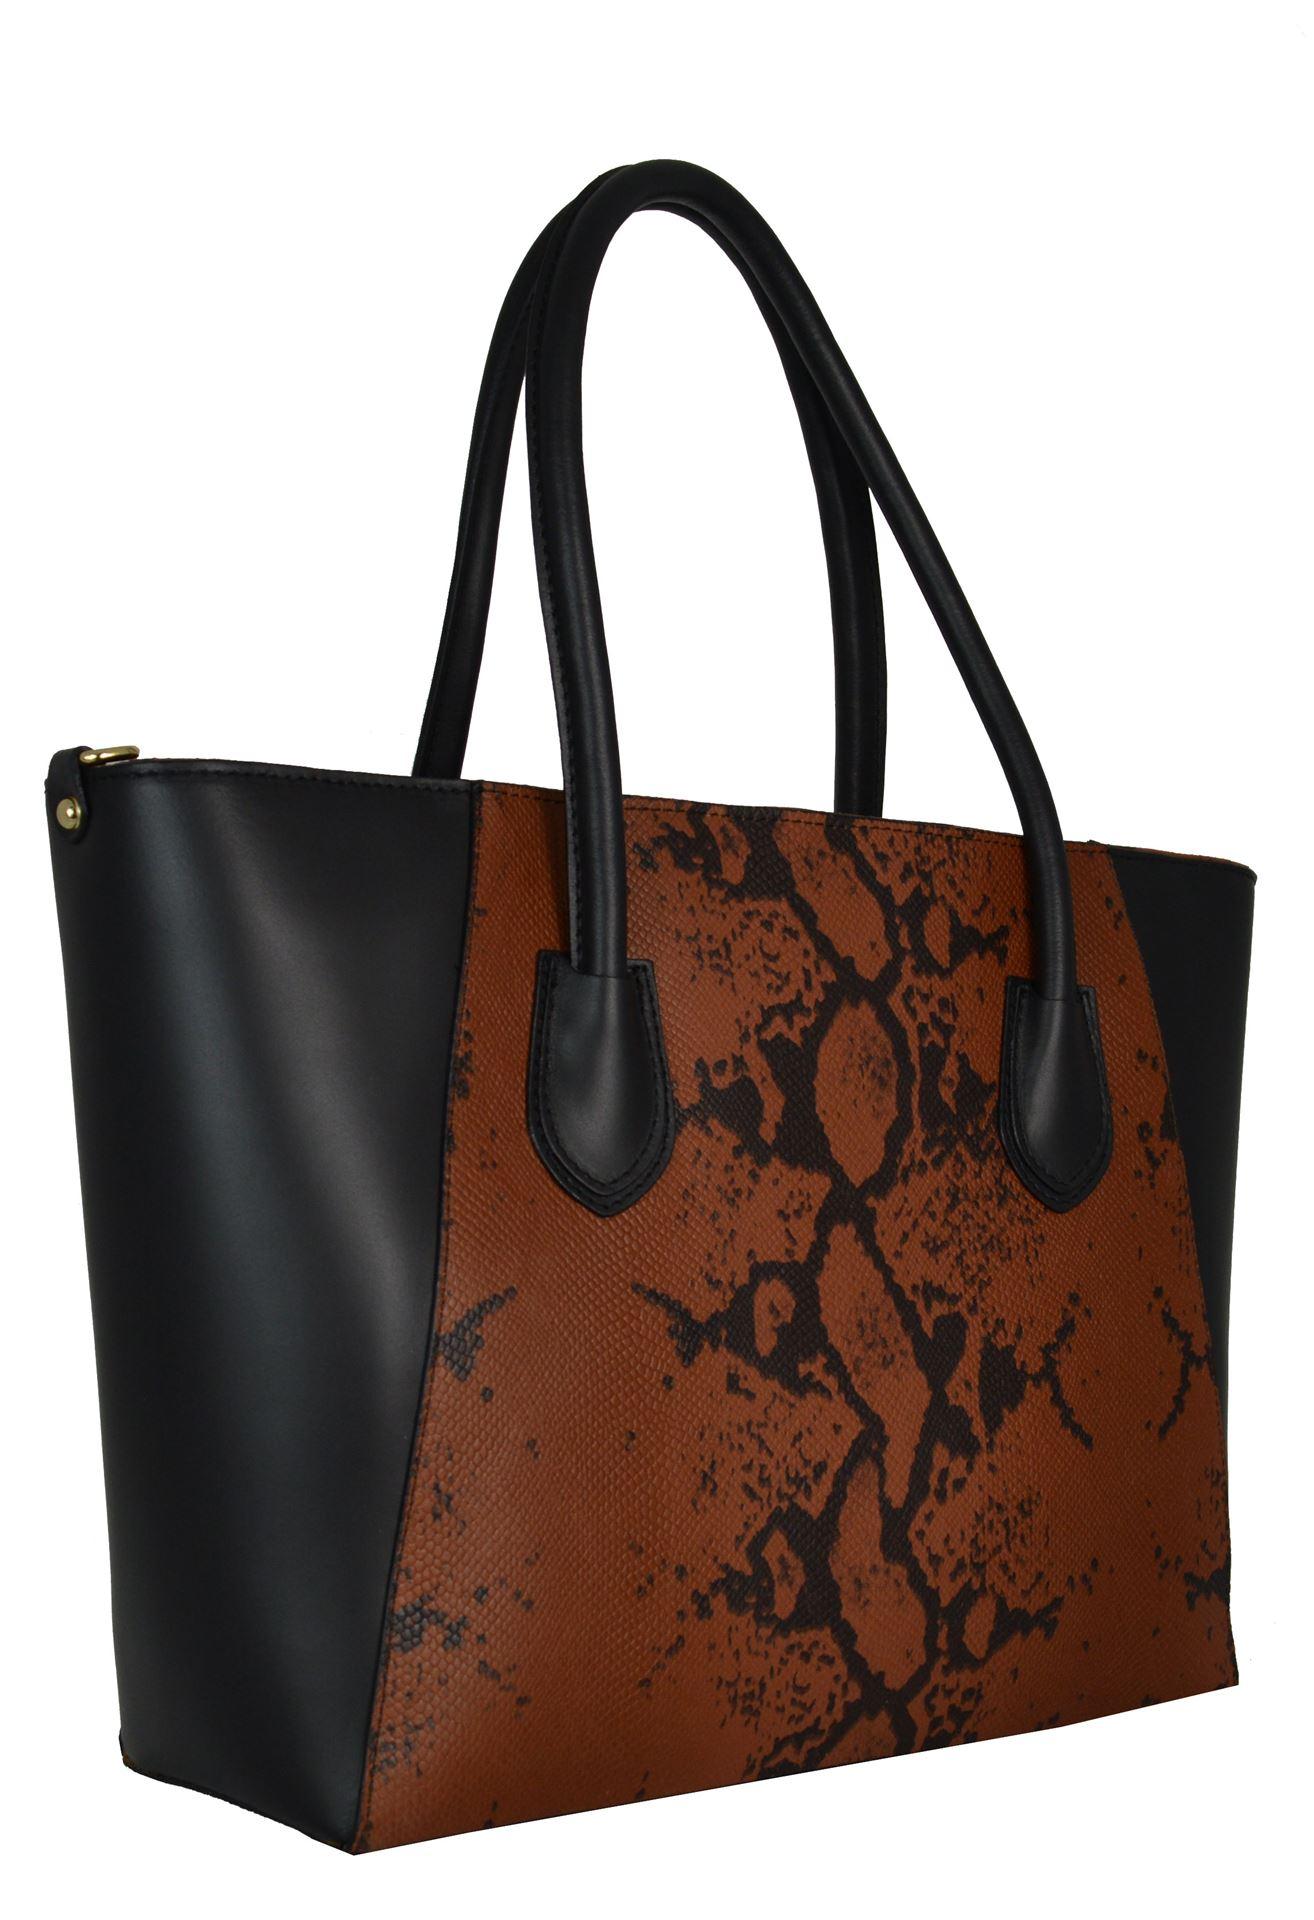 87b2d3debf83 Δερμάτινη γυναικεία τσάντα - PE-s705- black-tampa   tsanta-tsanta.gr